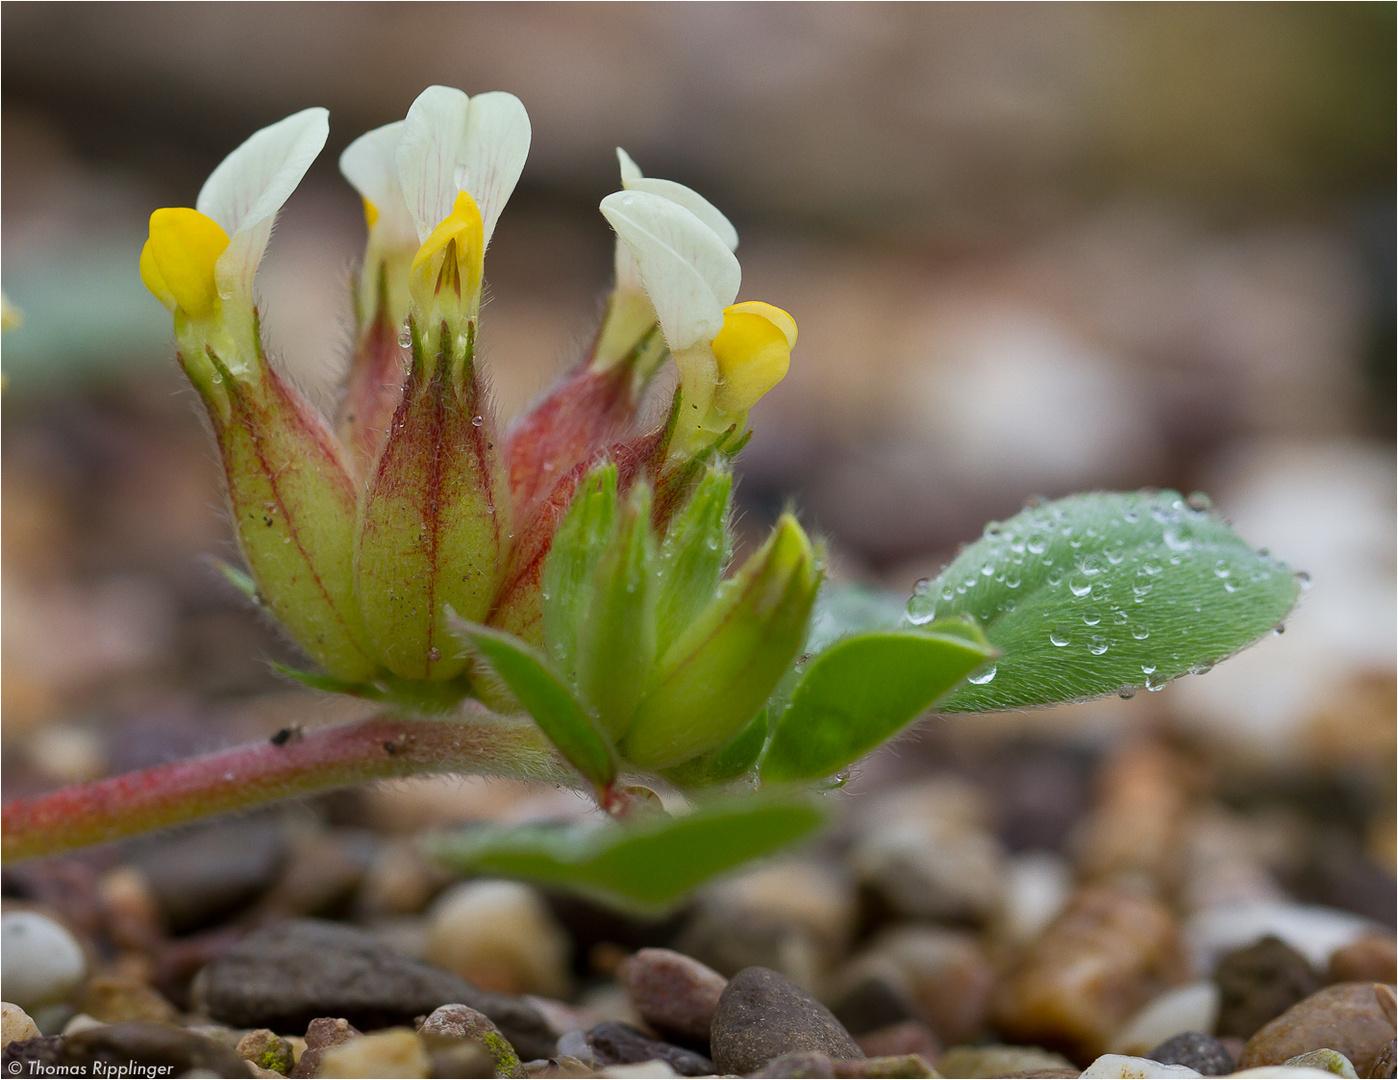 Wundklee (Anthyllis tetraphylla)..